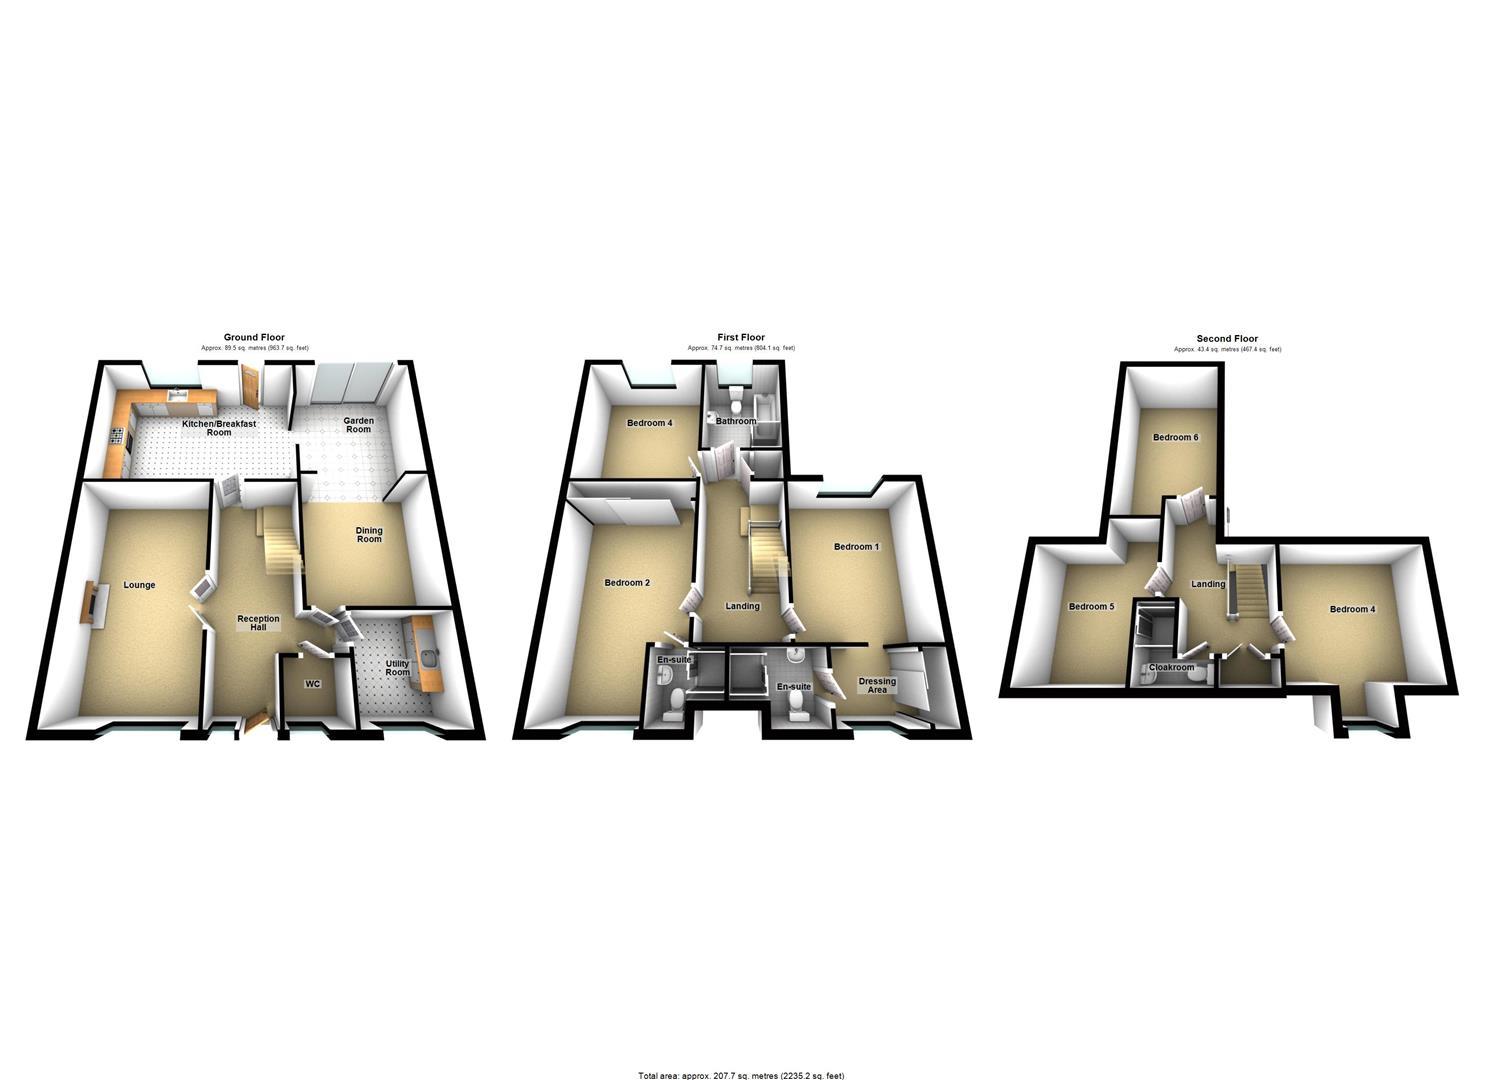 Burrows Close Southgate Swansea SA3 6 bedroom detached  : 7935e012af82e68391db03a238b91966f0921a6e from www.primelocation.com size 1485 x 1080 jpeg 94kB